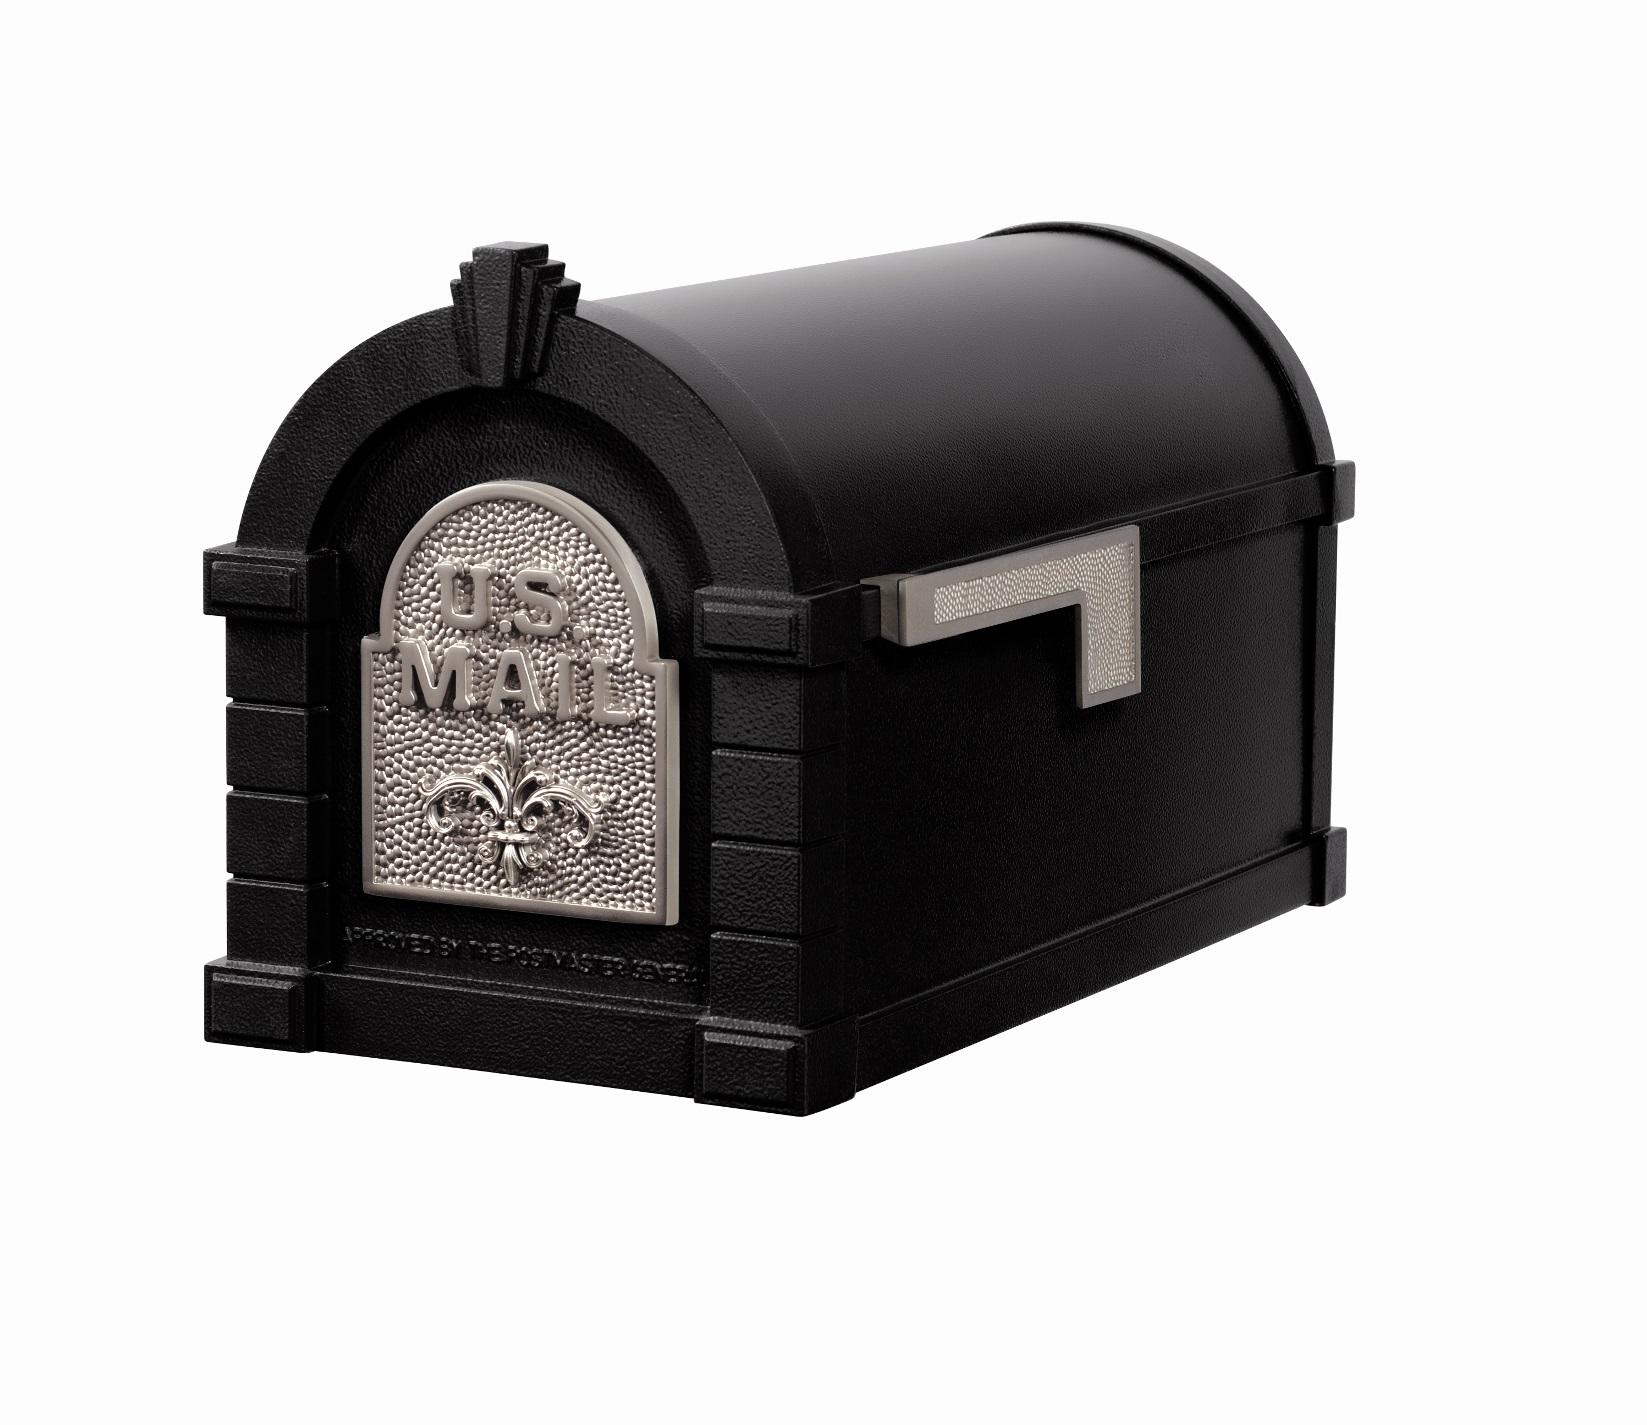 Buy Ks 25f Keystone Series Black With Satin Nickel Mailbox